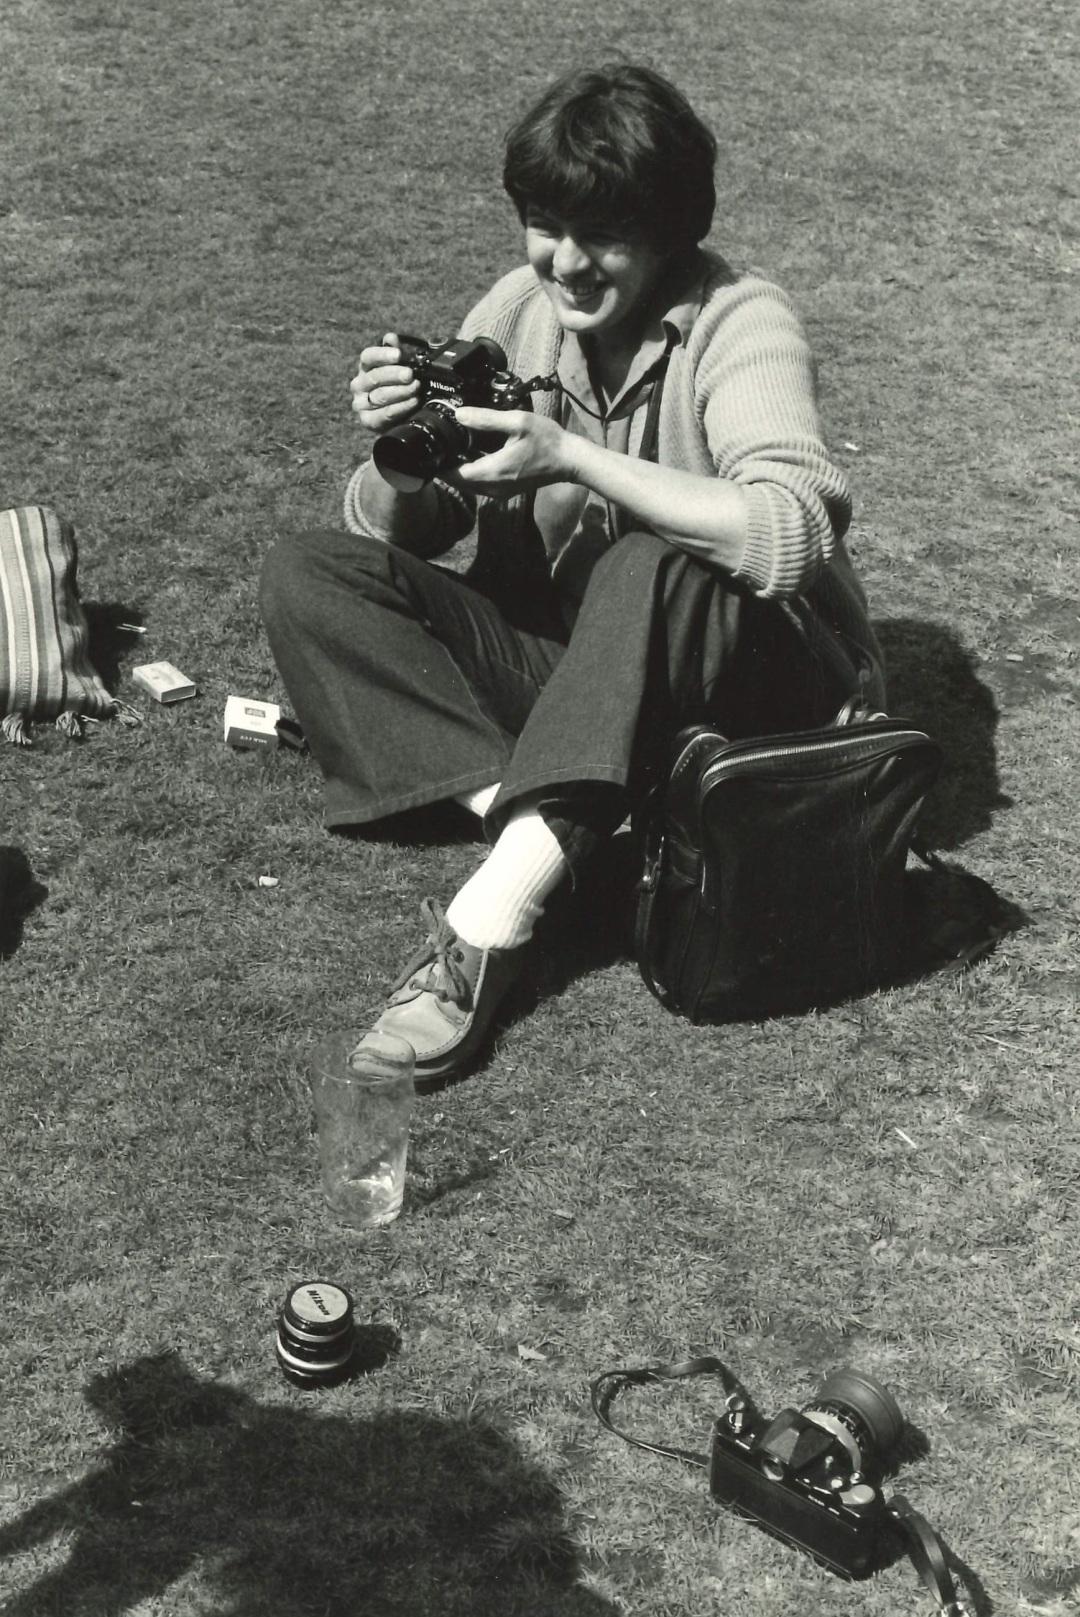 Photograph of Raissa Page, early 1980s, photographer unknown, thanks to Richard Burton Archives, Swansea University